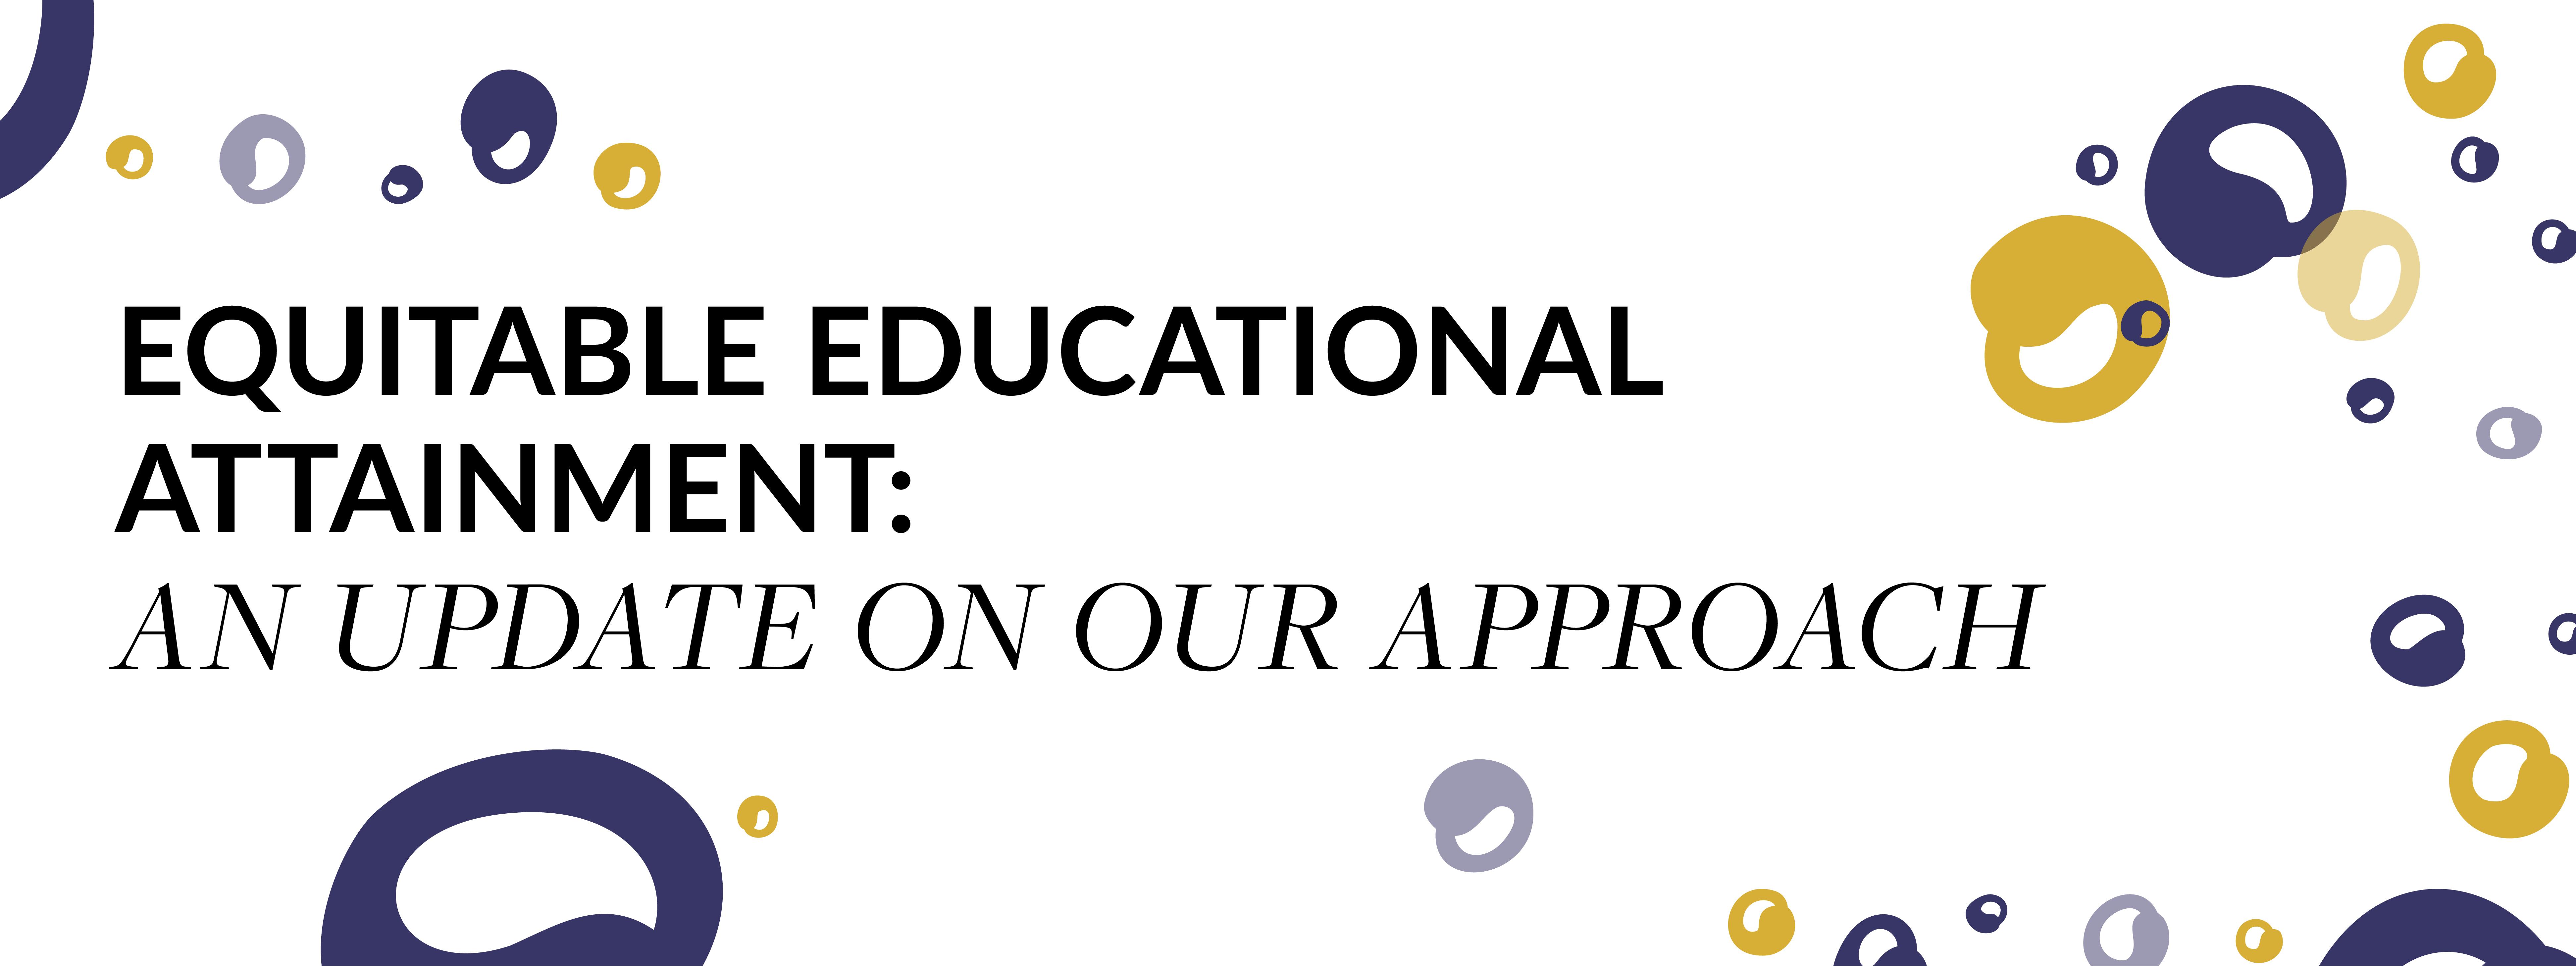 Equitable-Educational-Attainment.jpg#asset:4983